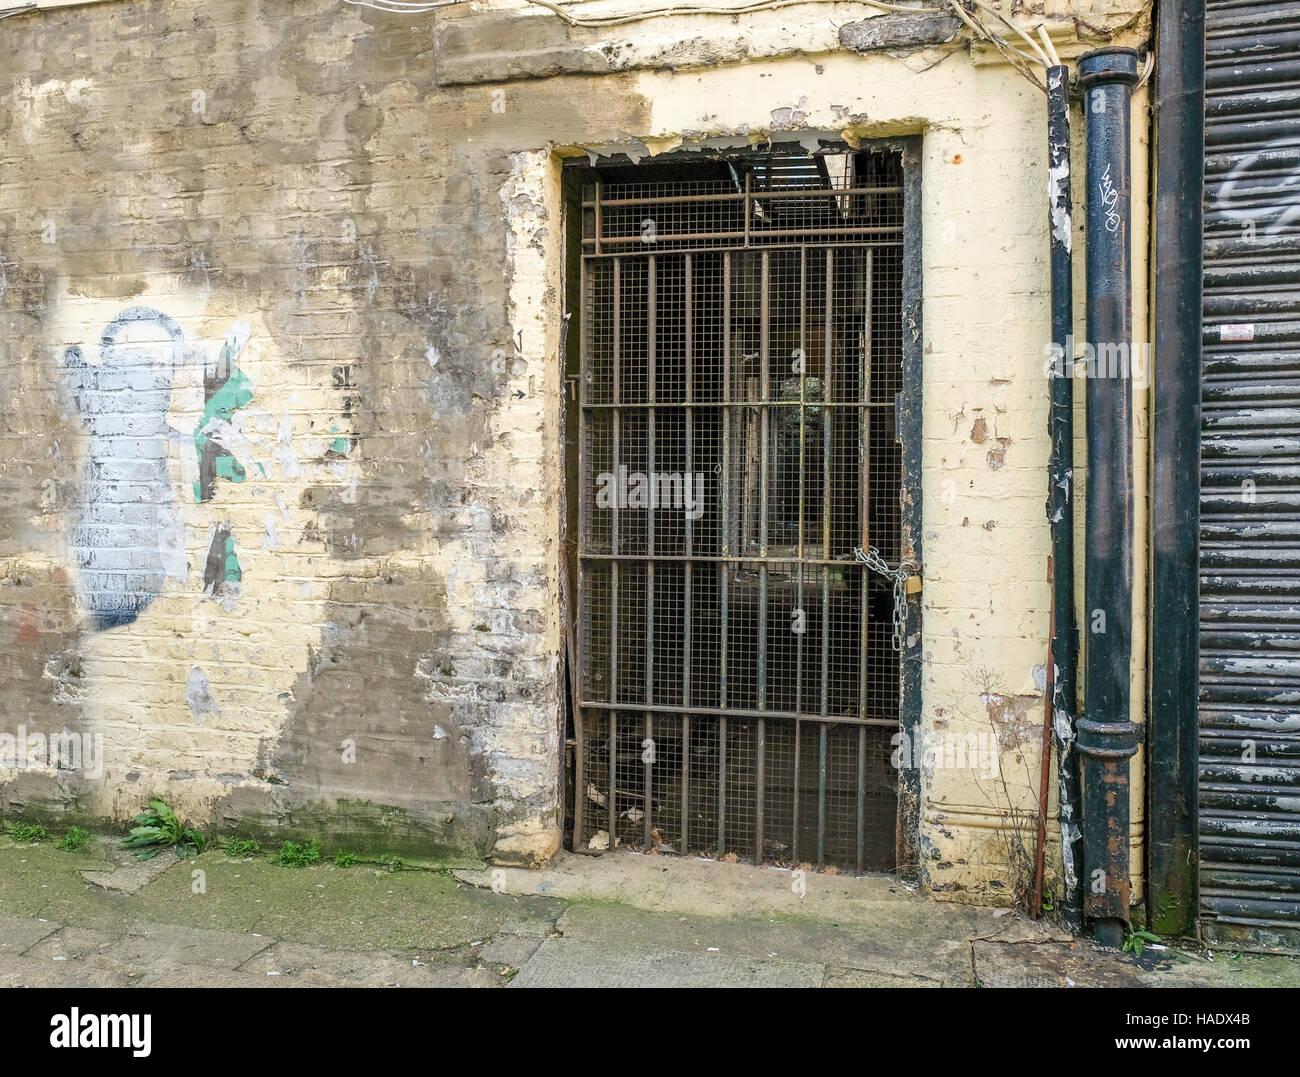 Old metal barred and grilled door way forgotten and abandoned & Old metal barred and grilled door way forgotten and abandoned Stock ...